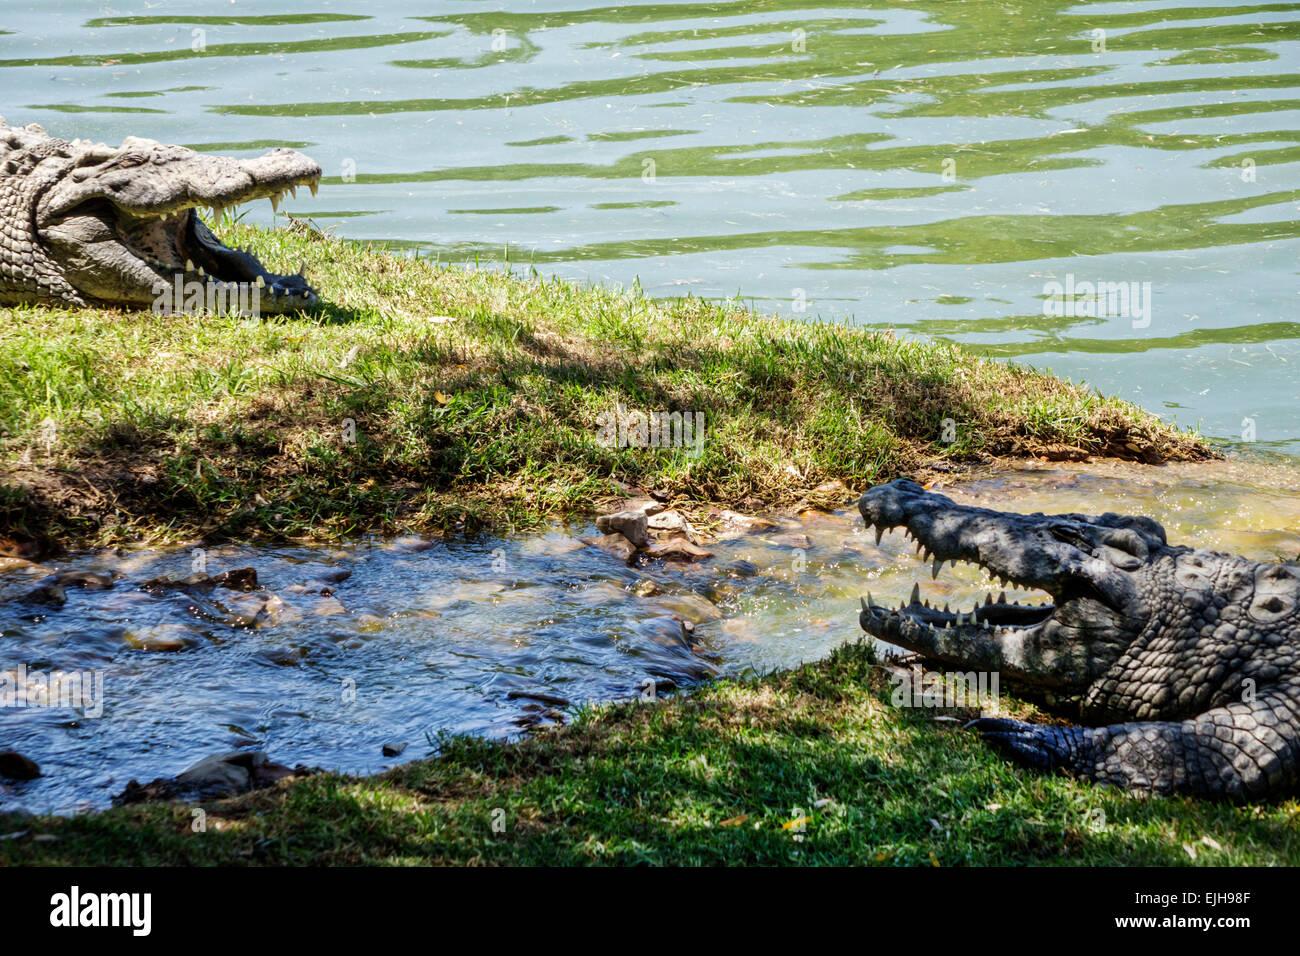 Johannesburg South Africa African Croc City Crocodile & and Reptile Park farm sunning - Stock Image